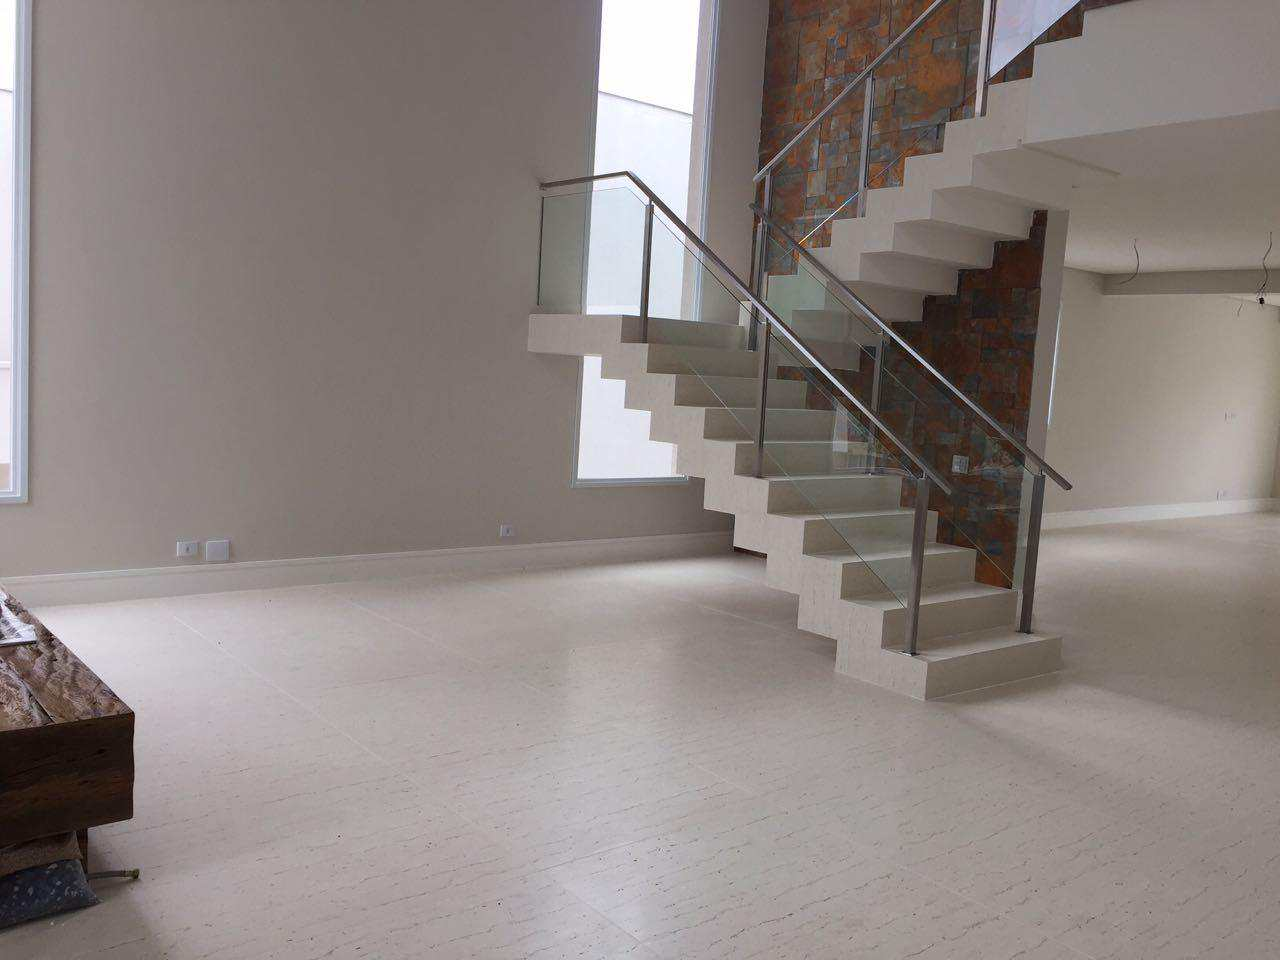 Nova Casa de Condomínio com 4 suítes, ambientes integrados